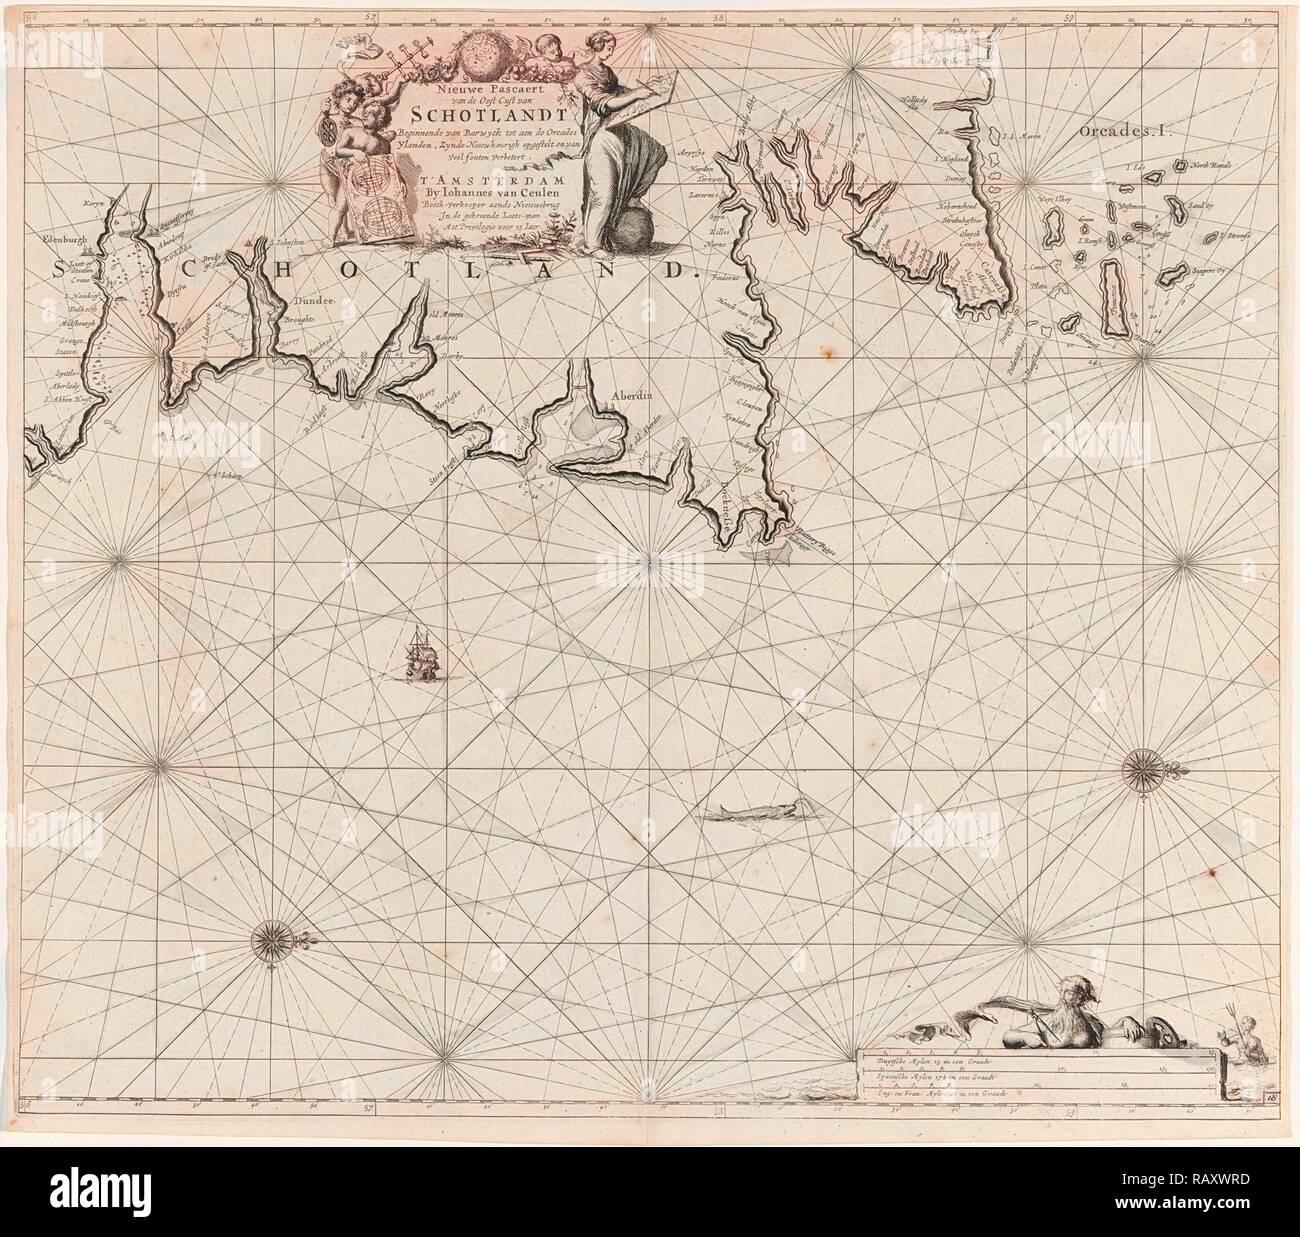 Sea chart of part of north east coast of Scotland and the Orkney Islands, Jan Luyken, Johannes van Keulen I, unknown reimagined - Stock Image